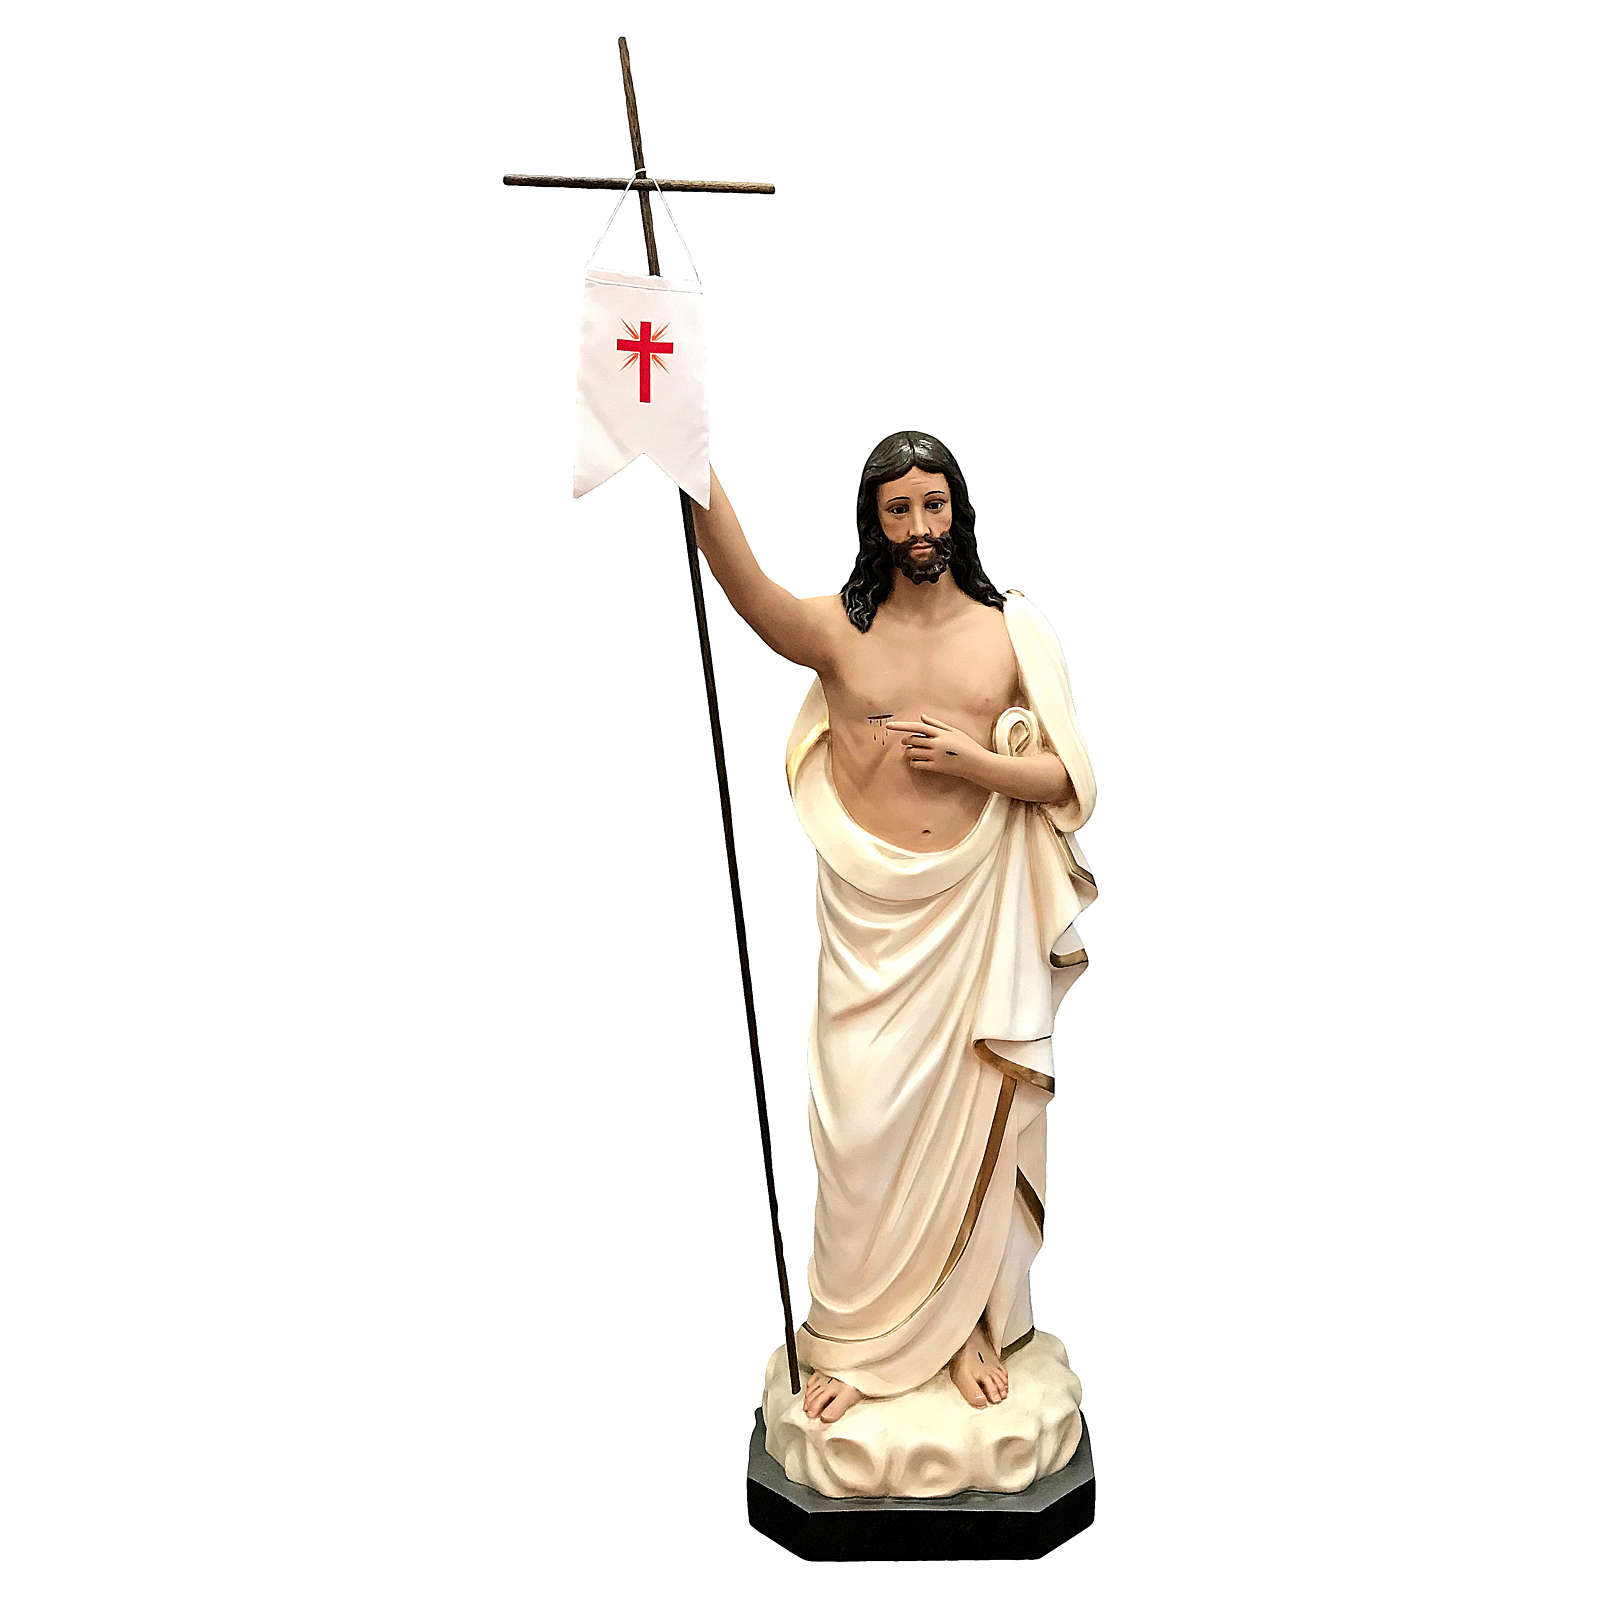 Statua Cristo risorto vetroresina 125 cm dipinta occhi vetro 4